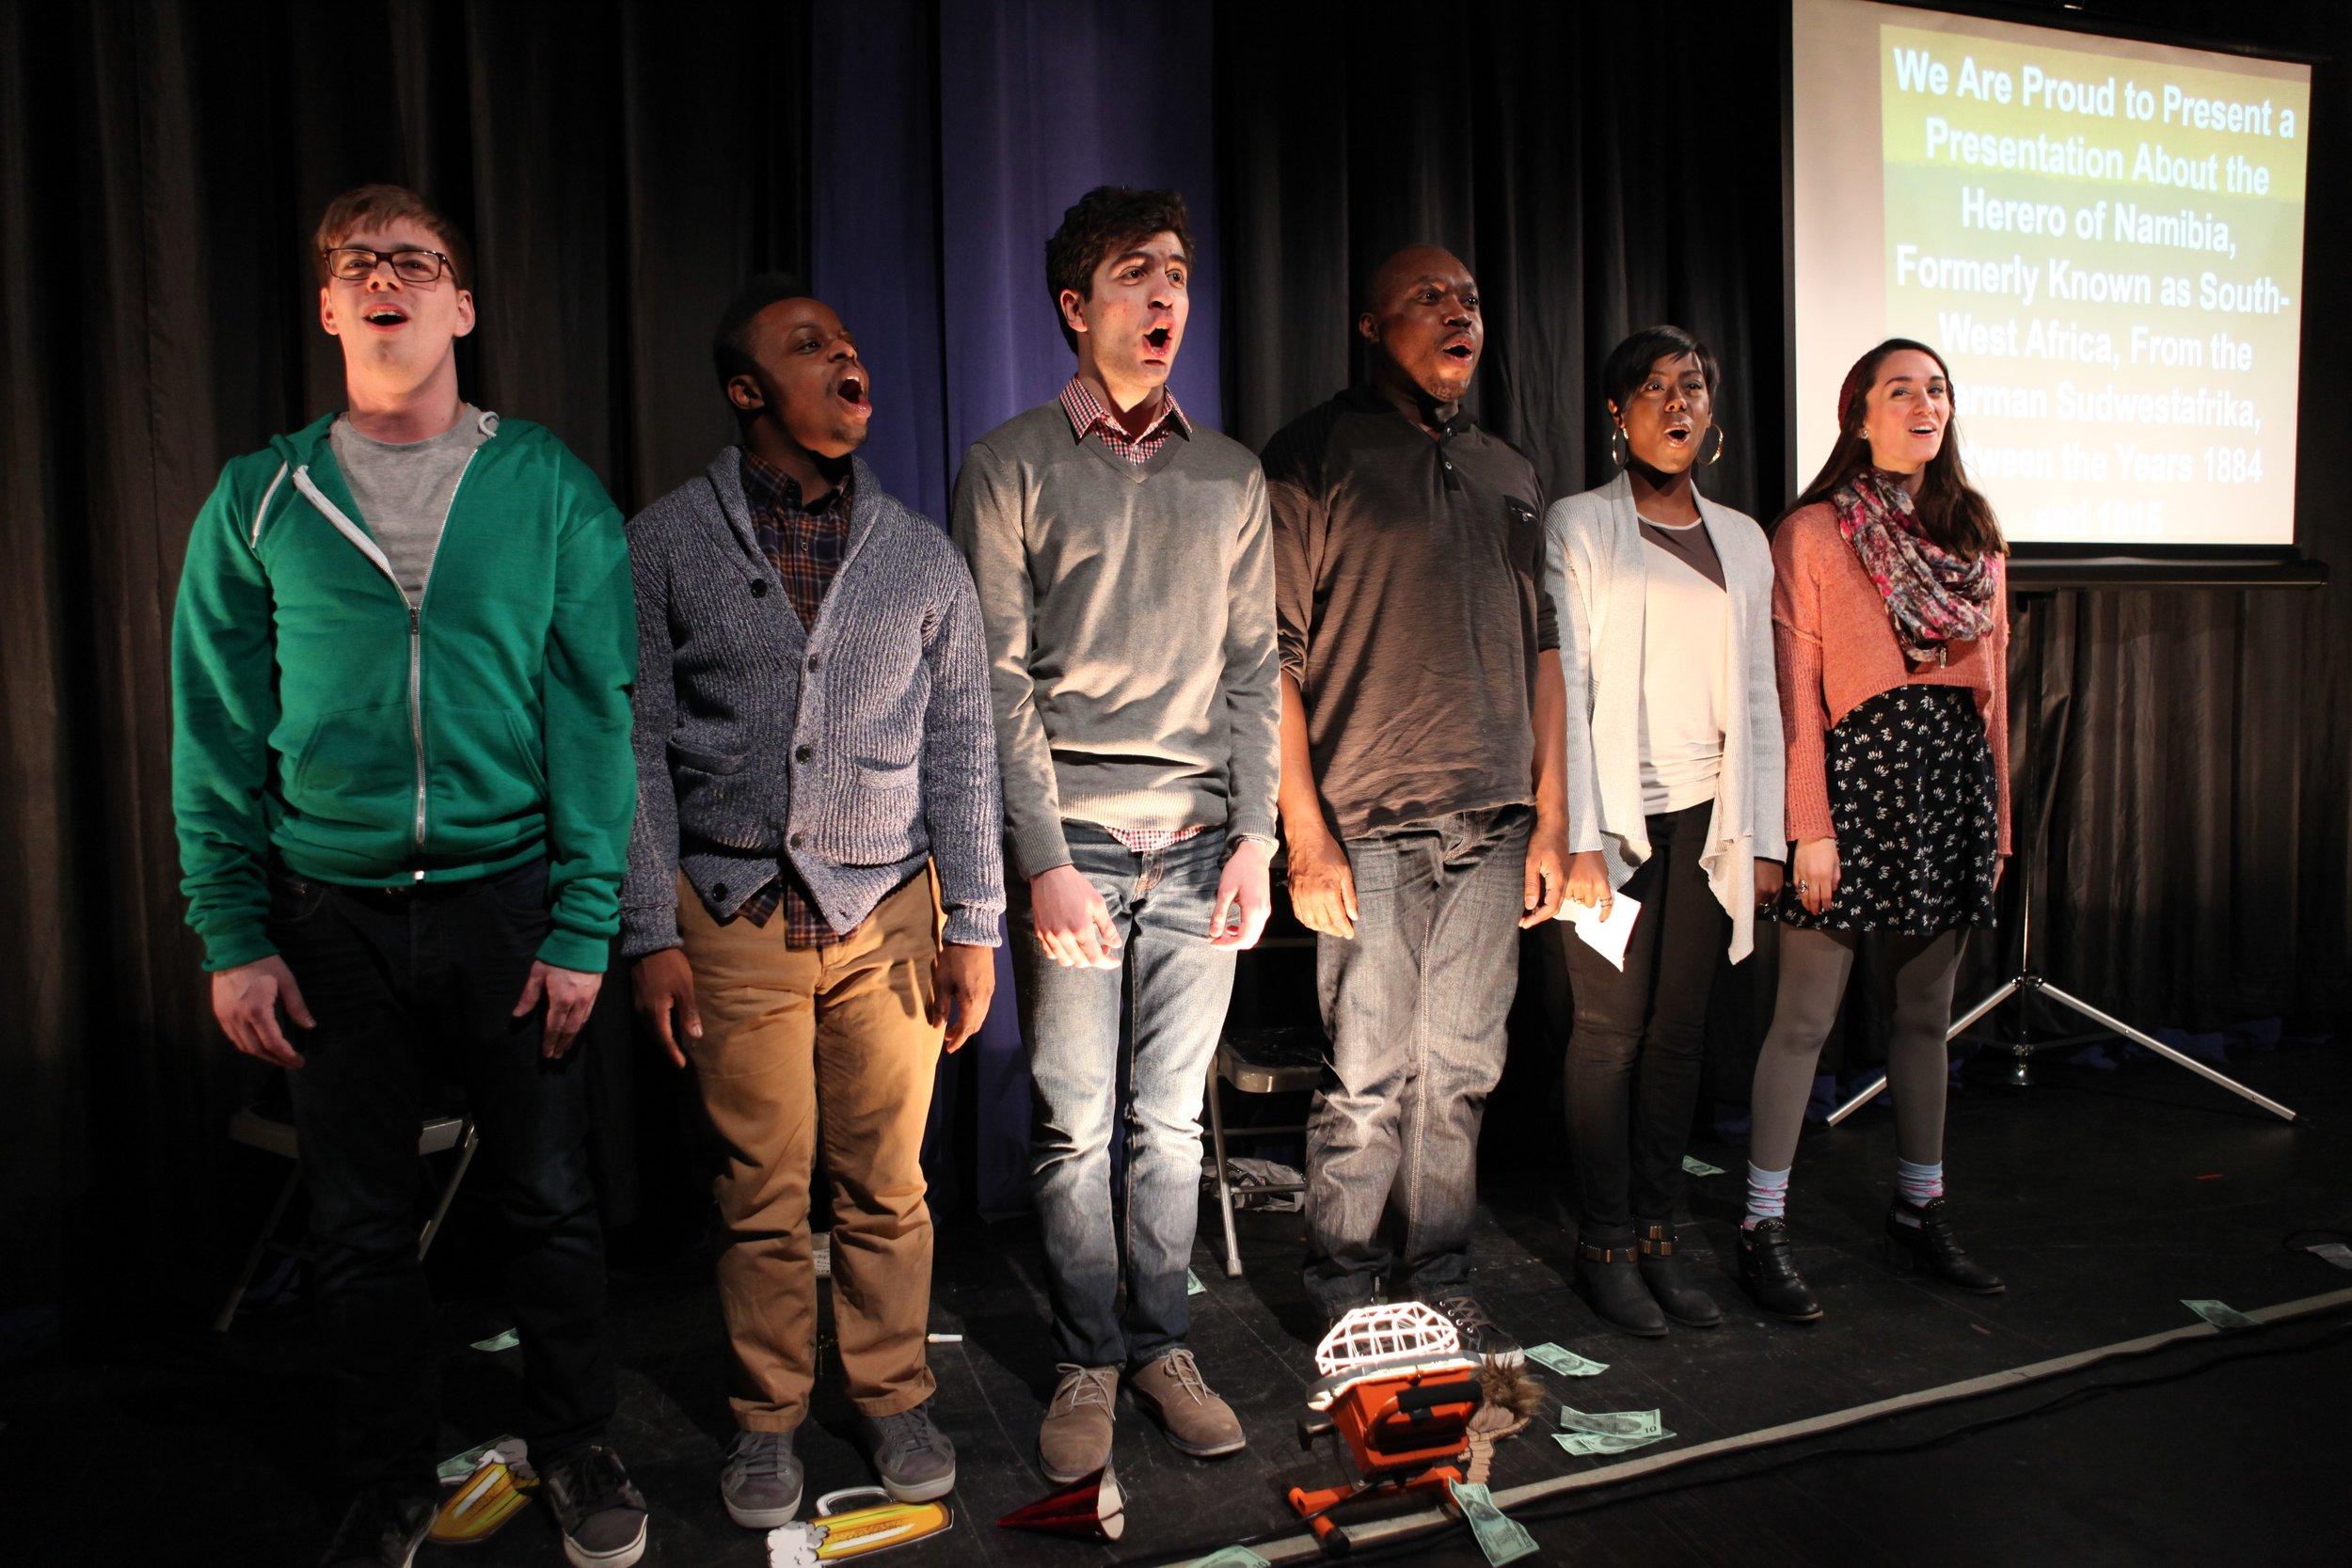 We Are Proud To Present… - By Jackie Sibblies Drury * Designed by Jason Ardizzone-West, Peter West, Beth Goldenberg & Brandon Wolcott * Fordham University, 2014